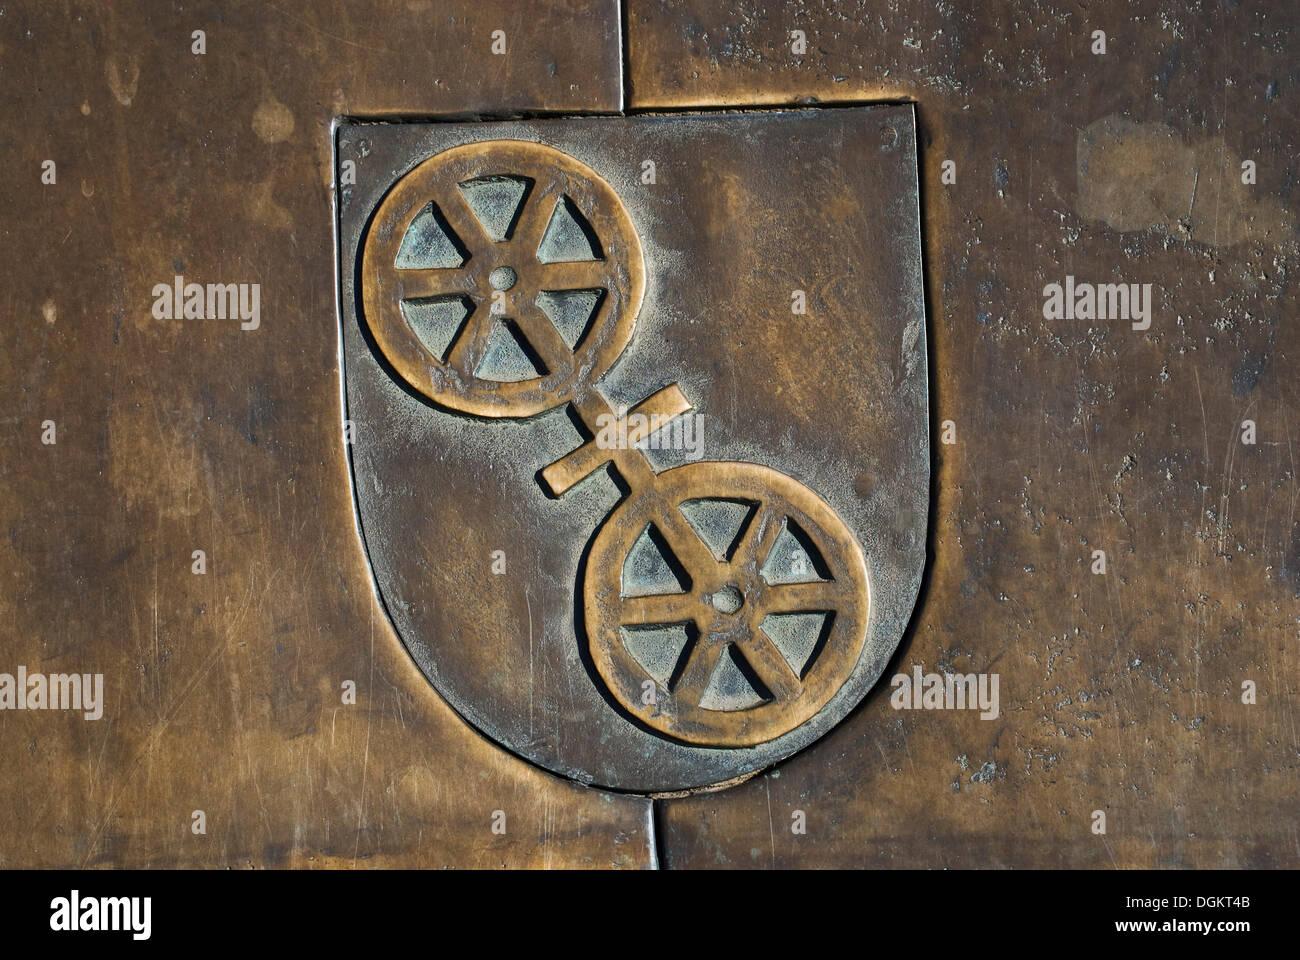 Armoiries en bronze, Mayence, capitale de la Rhénanie-Palatinat Photo Stock